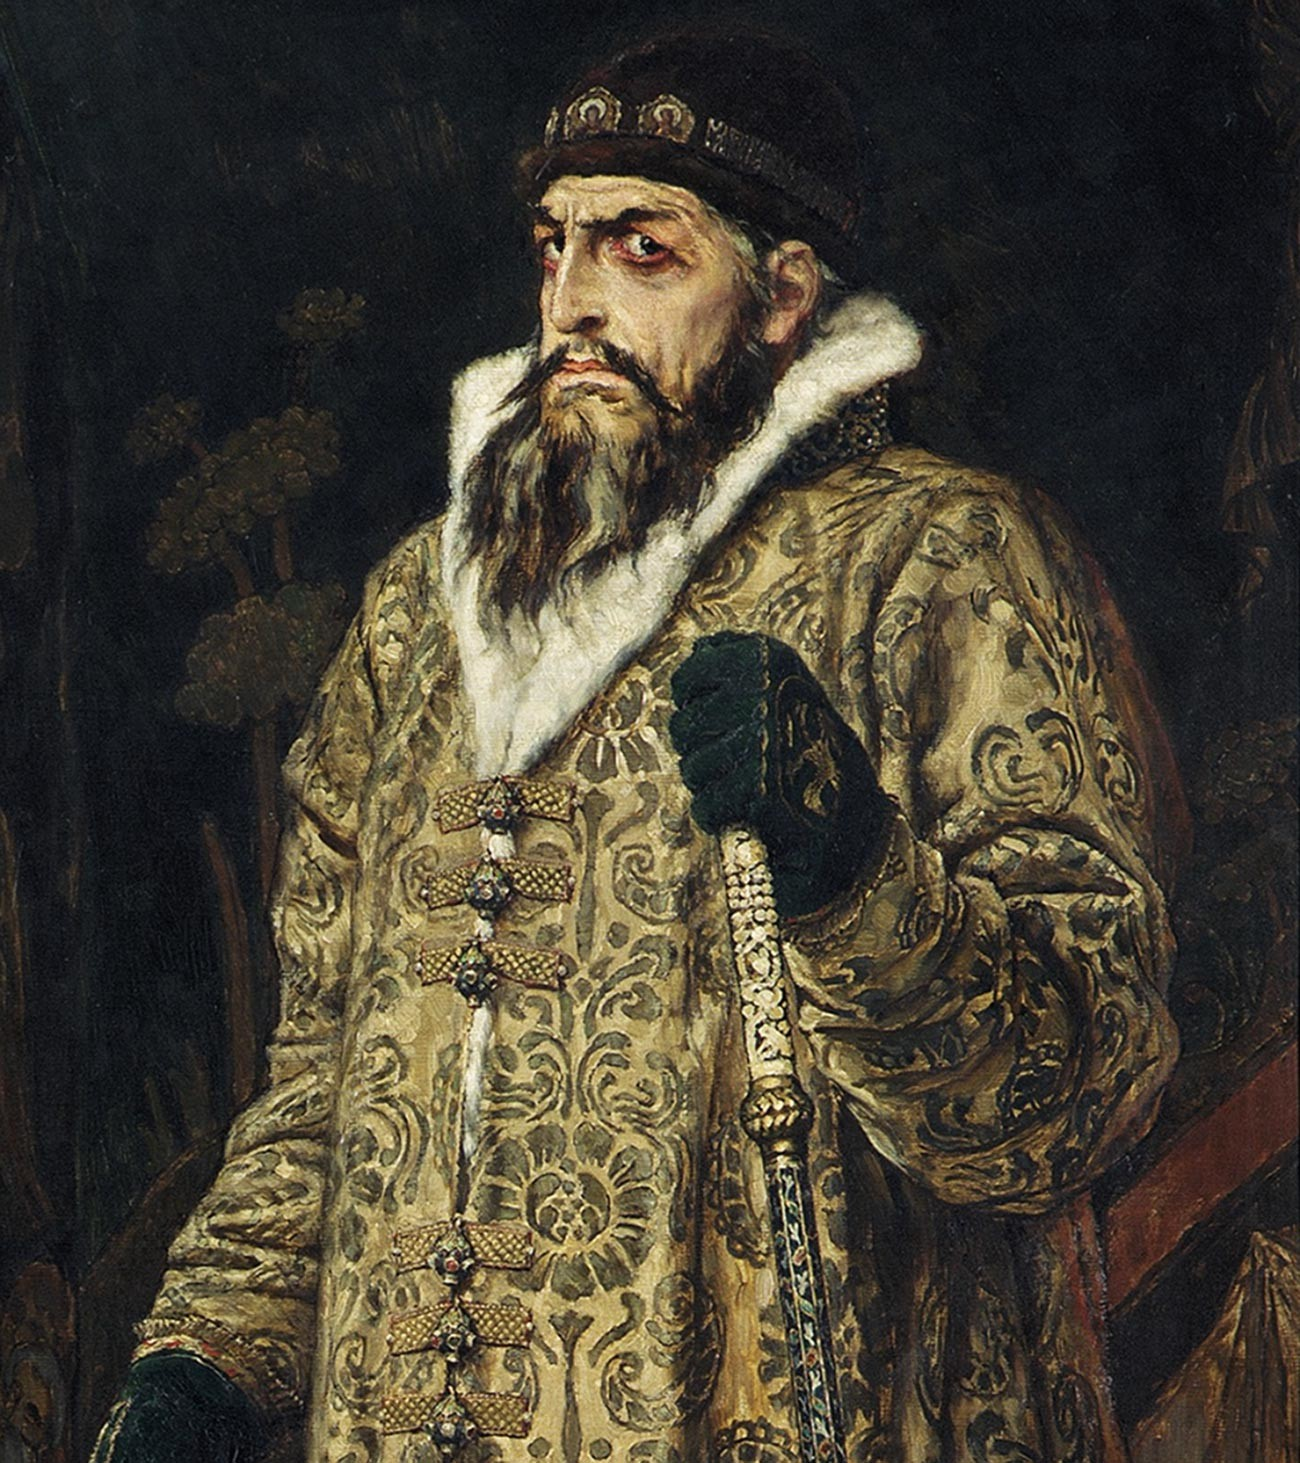 Ivan IV the Terrible by Viktor Vasnetsov, 1897